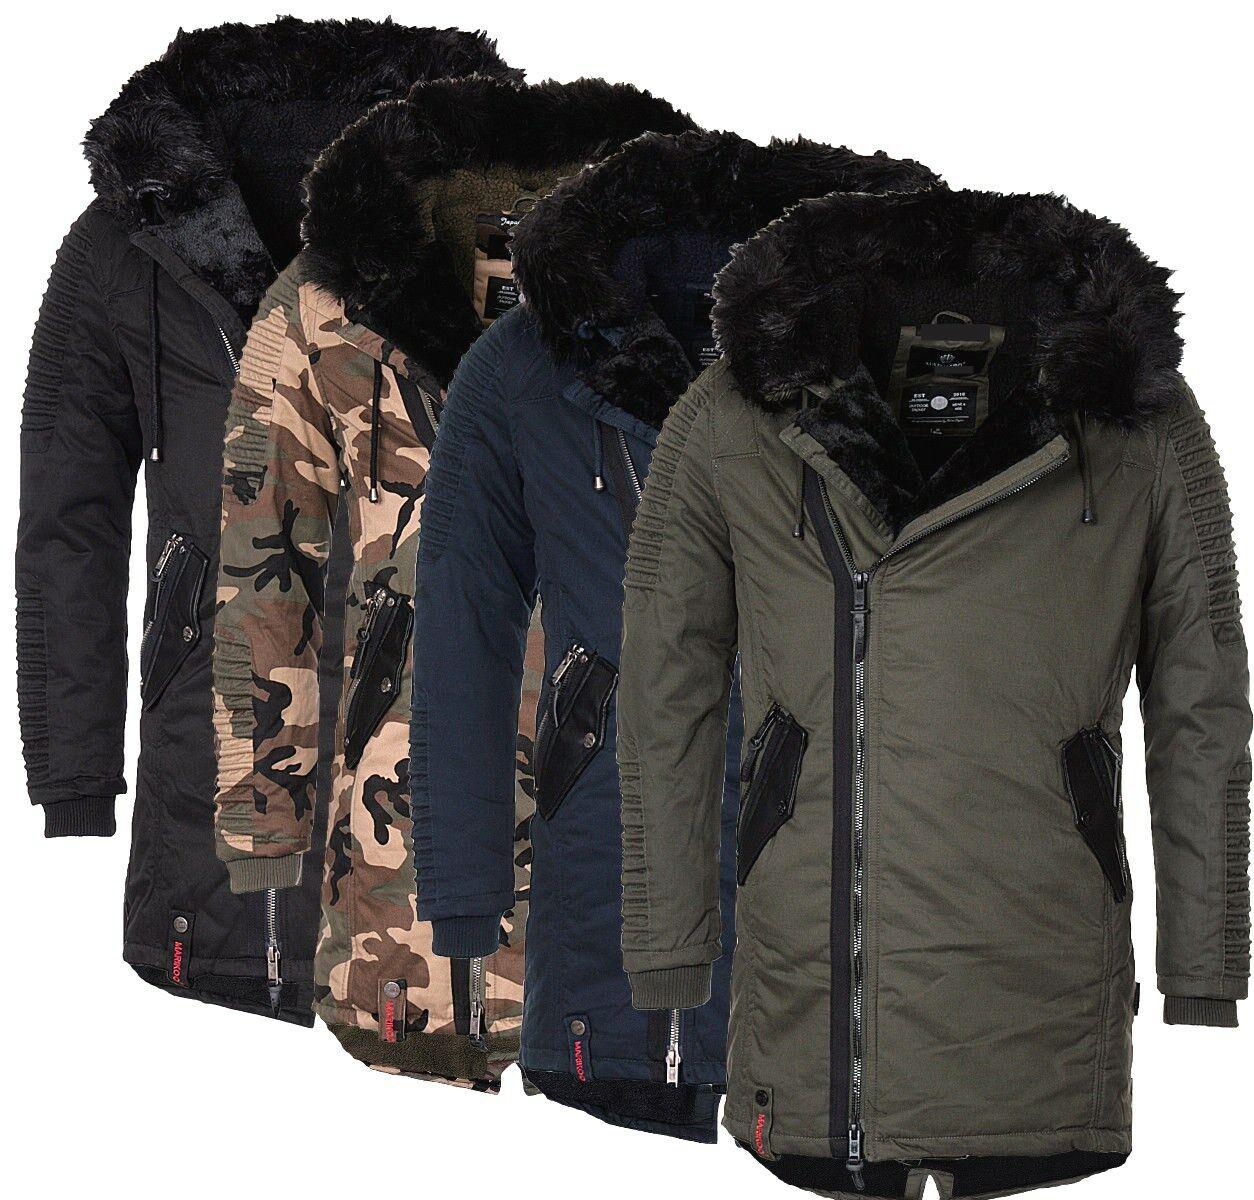 Marikoo Yasuoo warme Herren Winter Jacke Winter Parka mantel wildleder look Neu